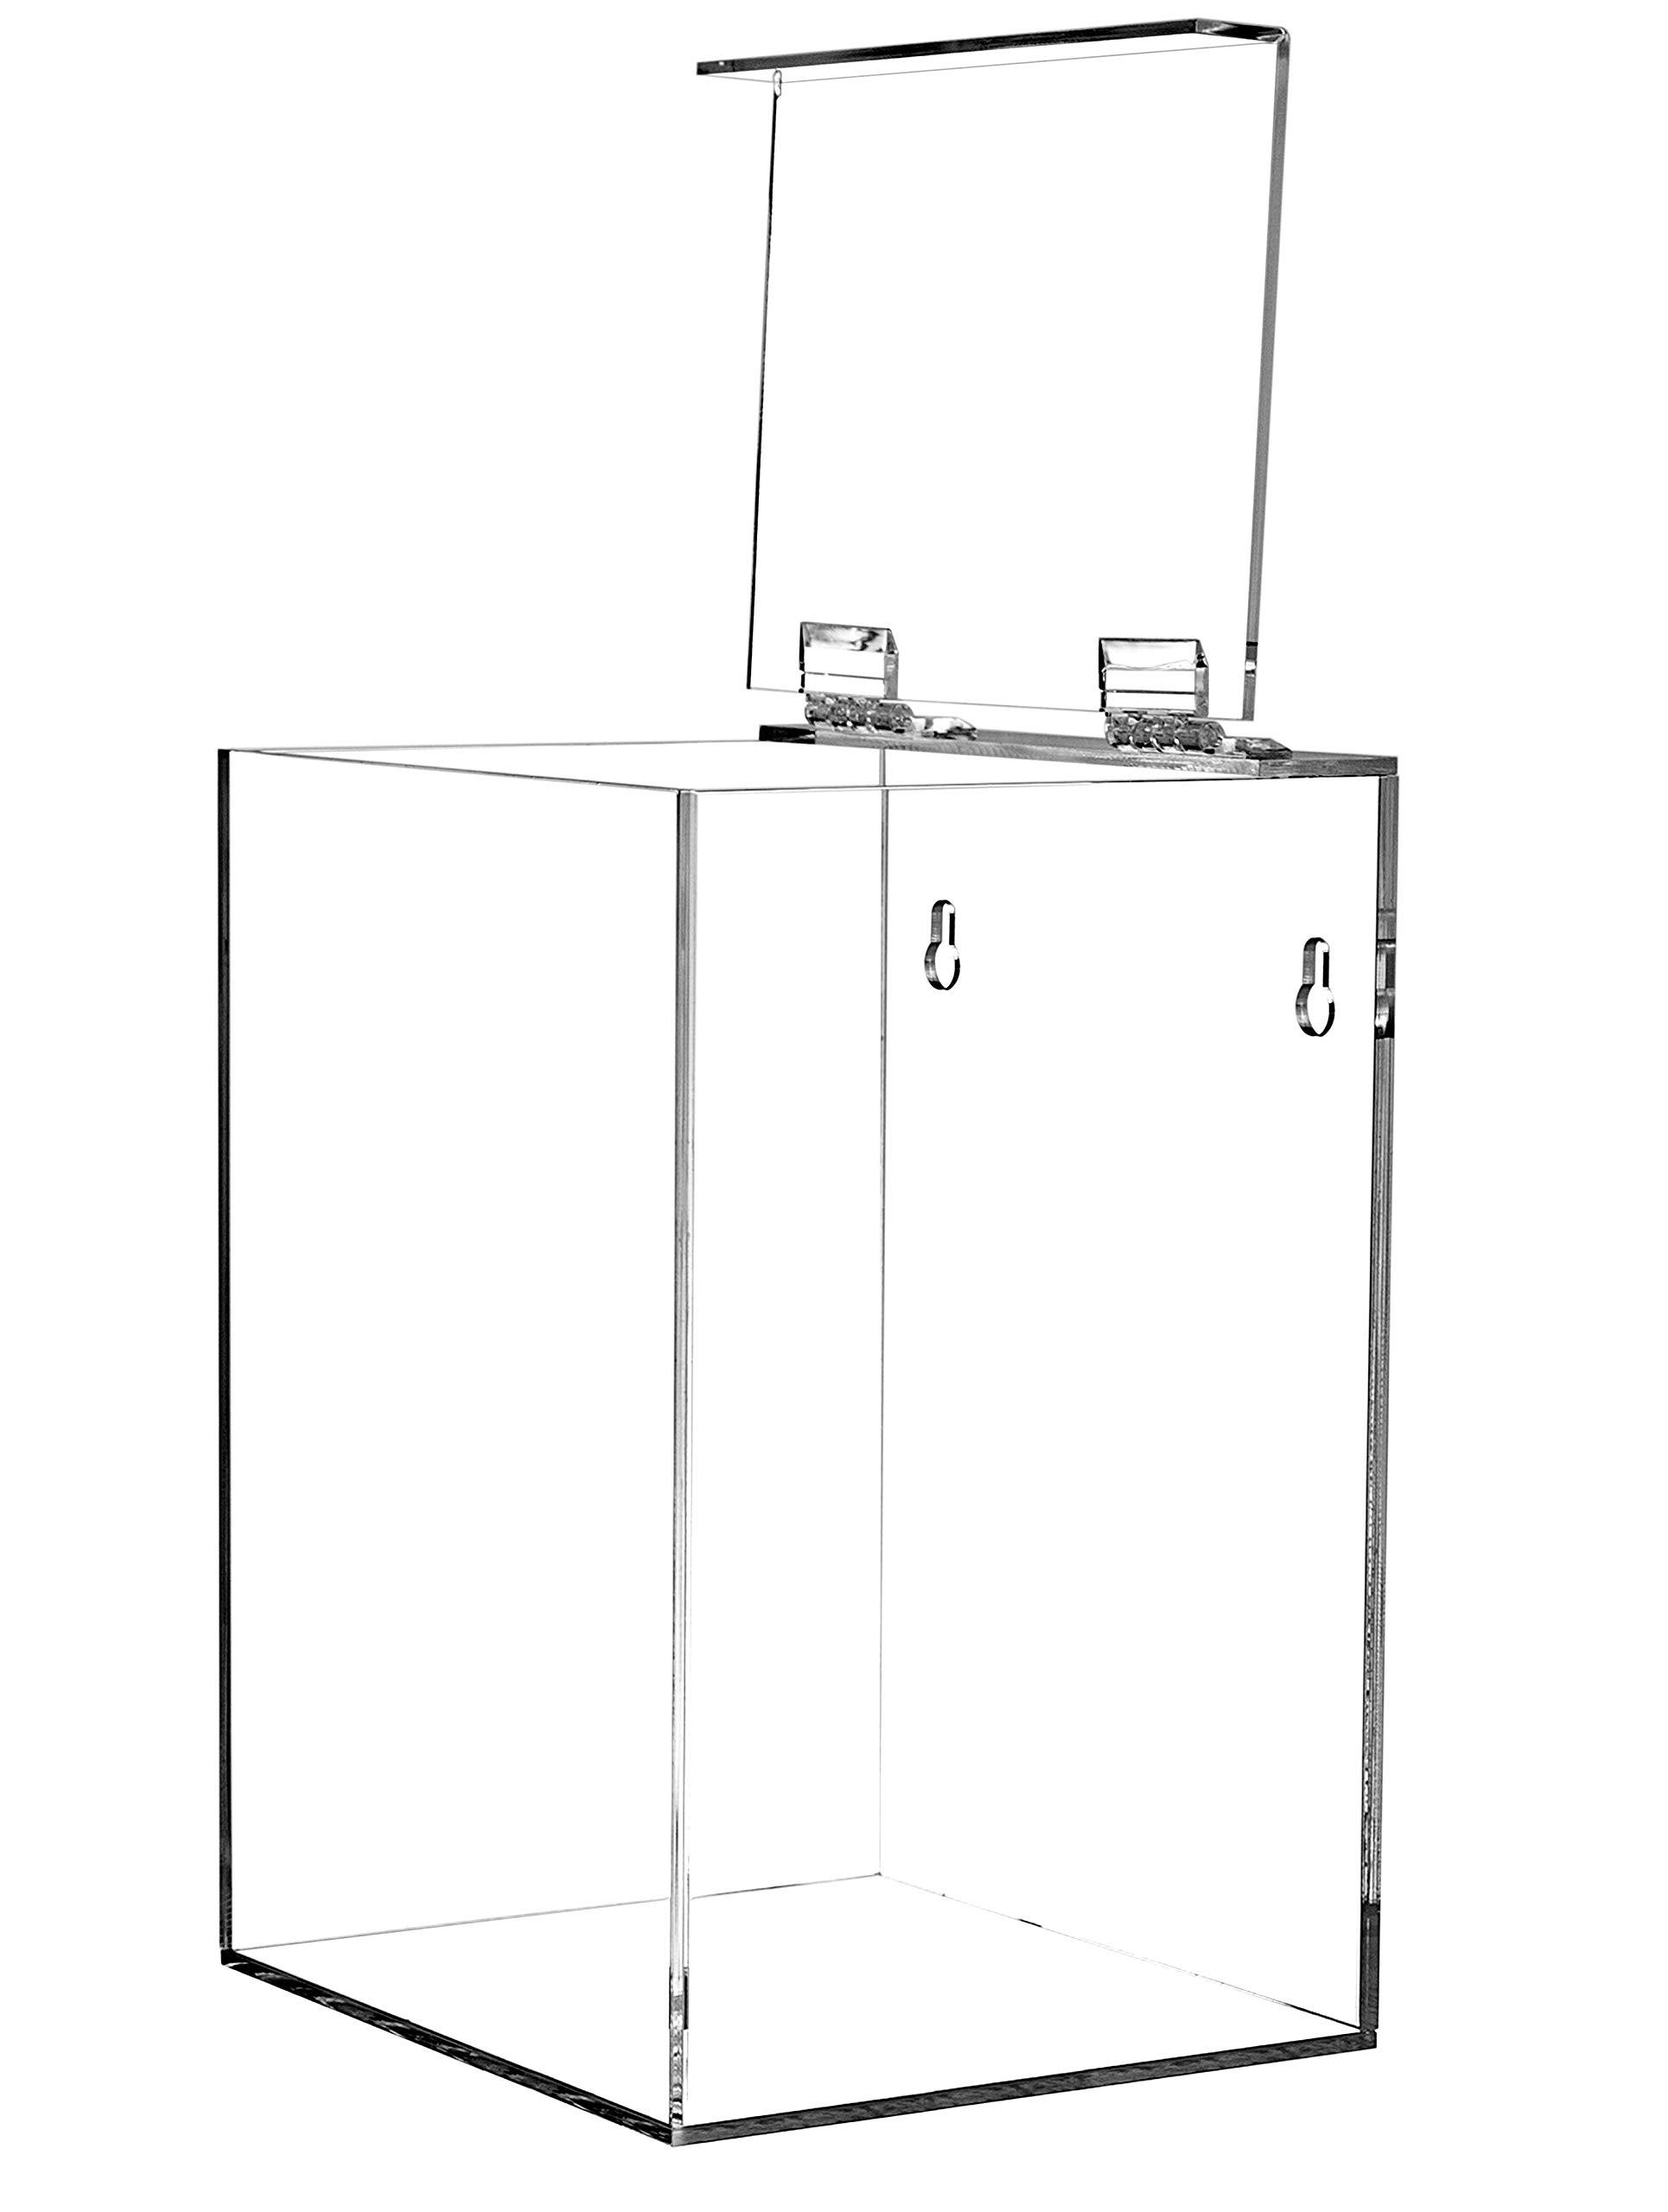 10.3-Inch Wide x 3.8-Inch Deep x 16-Inch High AH130 Kantek Acrylic Glove Dispenser Triple Box Capacity Clear